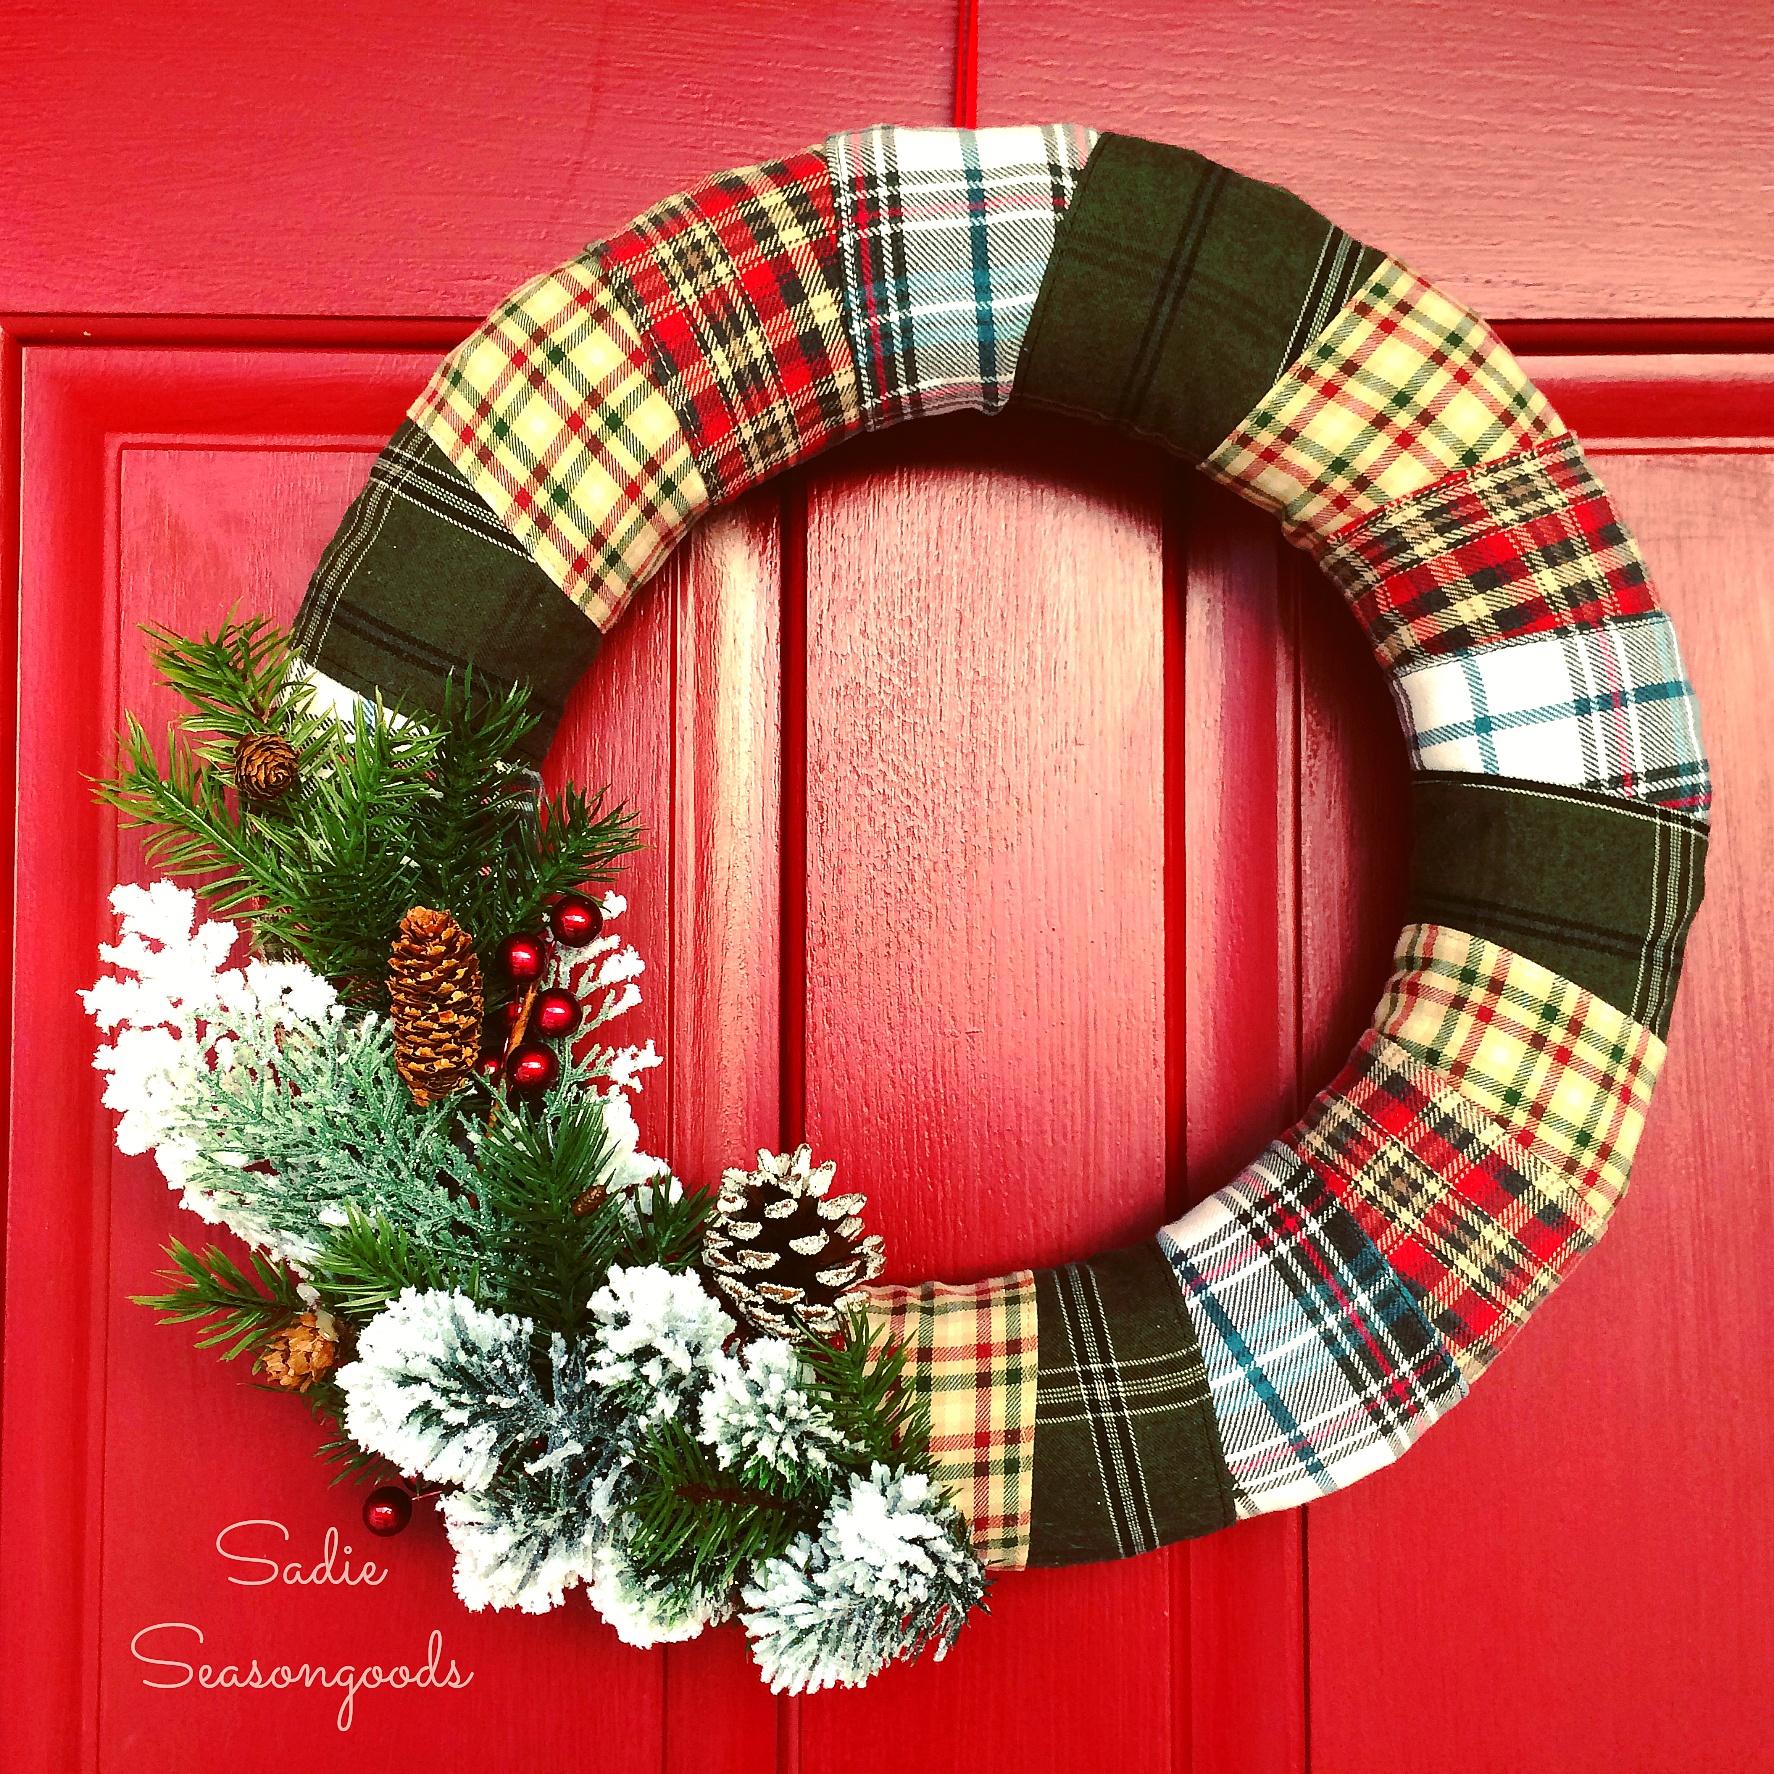 waste-not-wednesday-week-29-flannel_shirt_strip_wreath_for_winter_door_decor_sadie_seasongoods_smaller